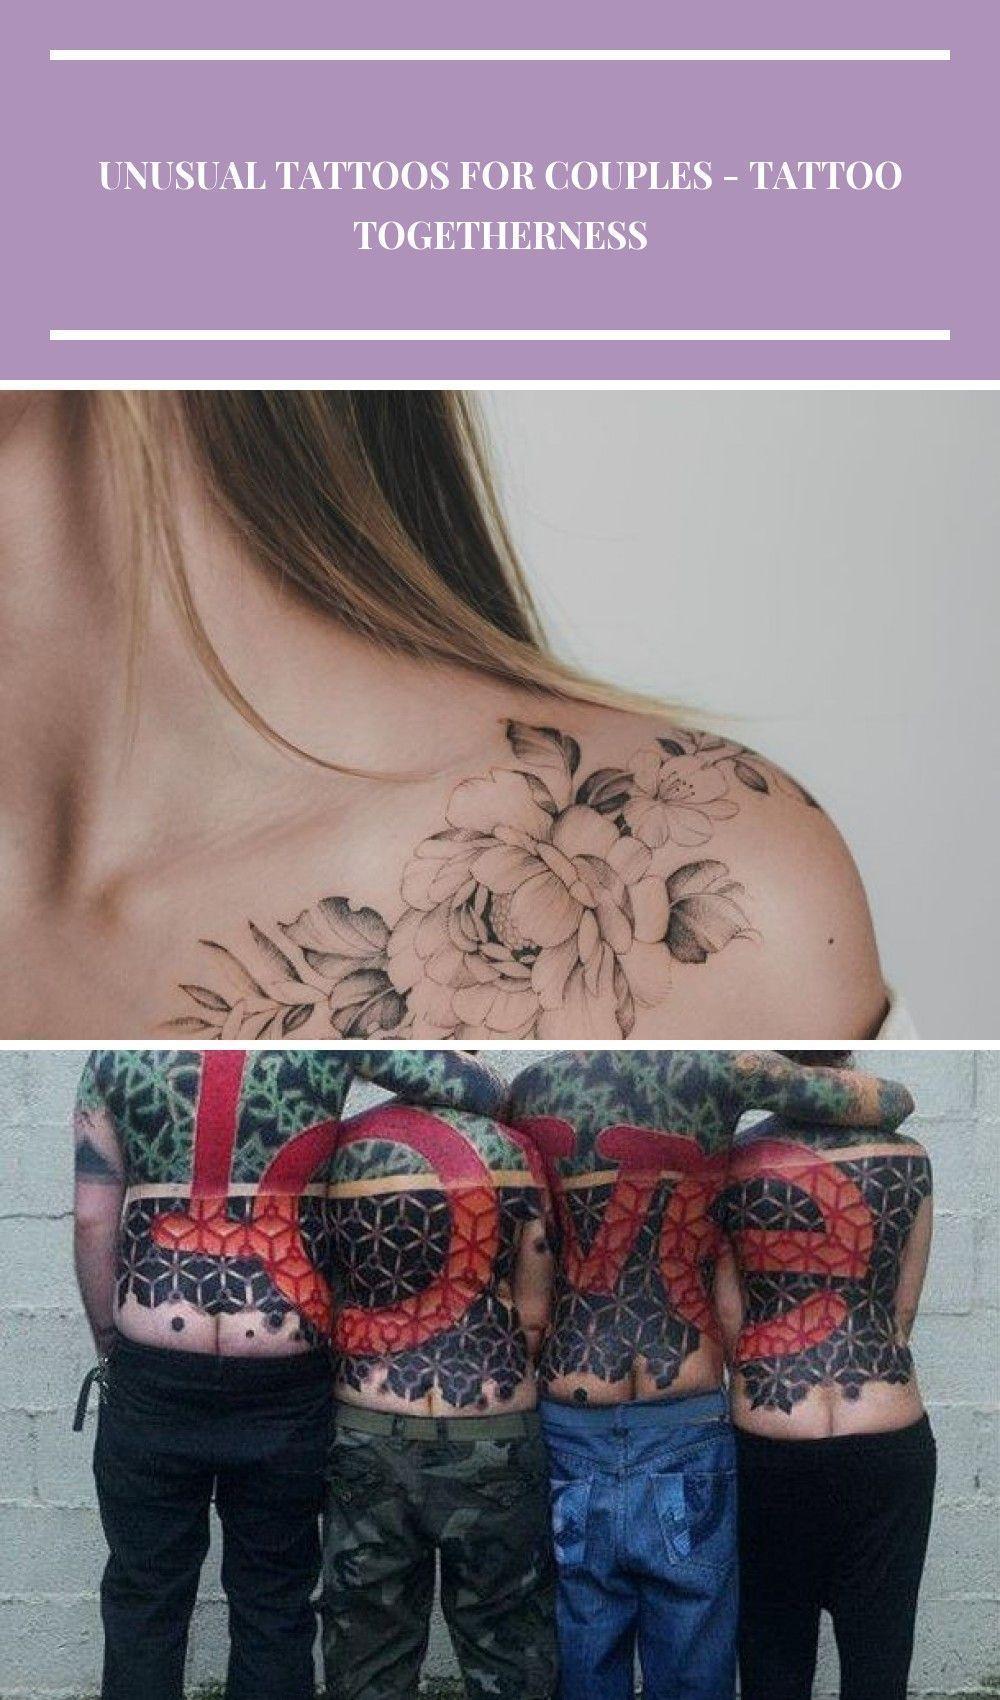 30 Yes Unusual Tattoos Unusual Tattoos 30 Yes Unusual 30